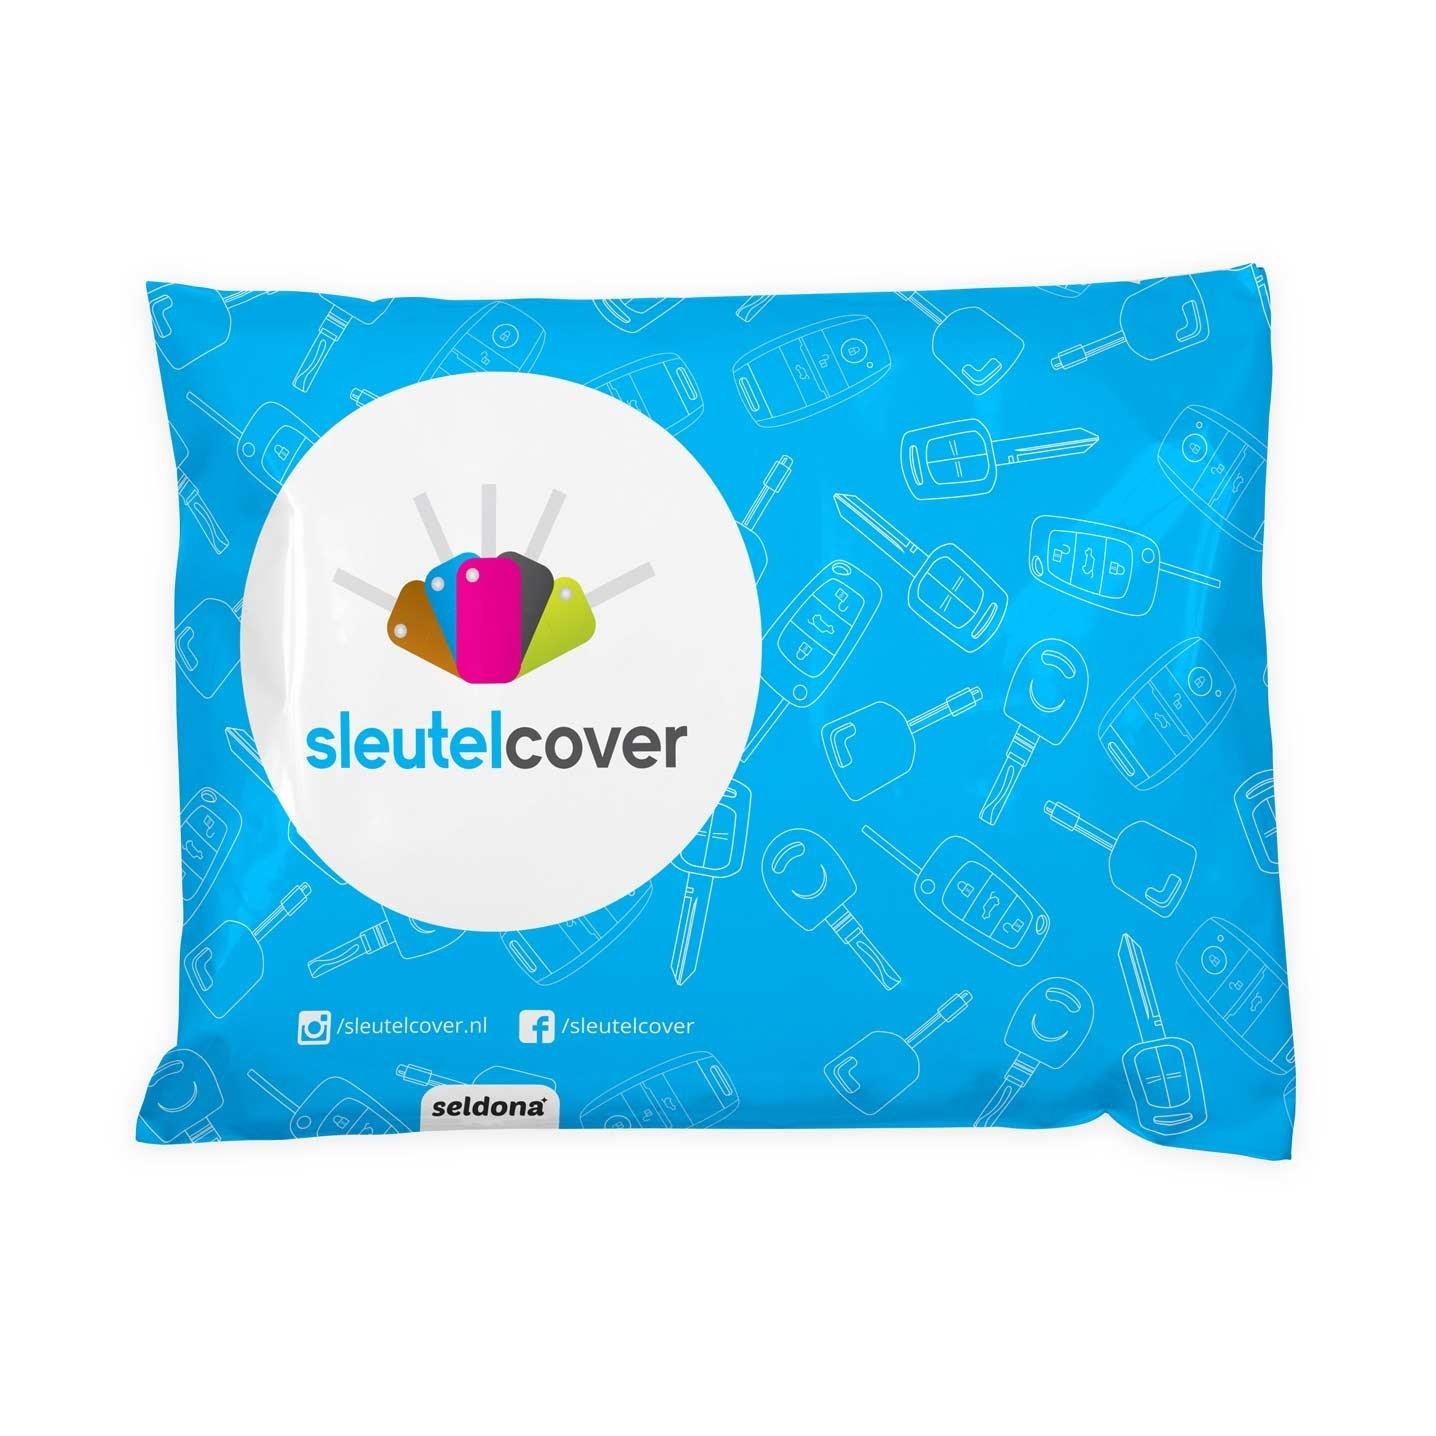 Mercedes SleutelCover - Blauw / Silicone sleutelhoesje / beschermhoesje autosleutel